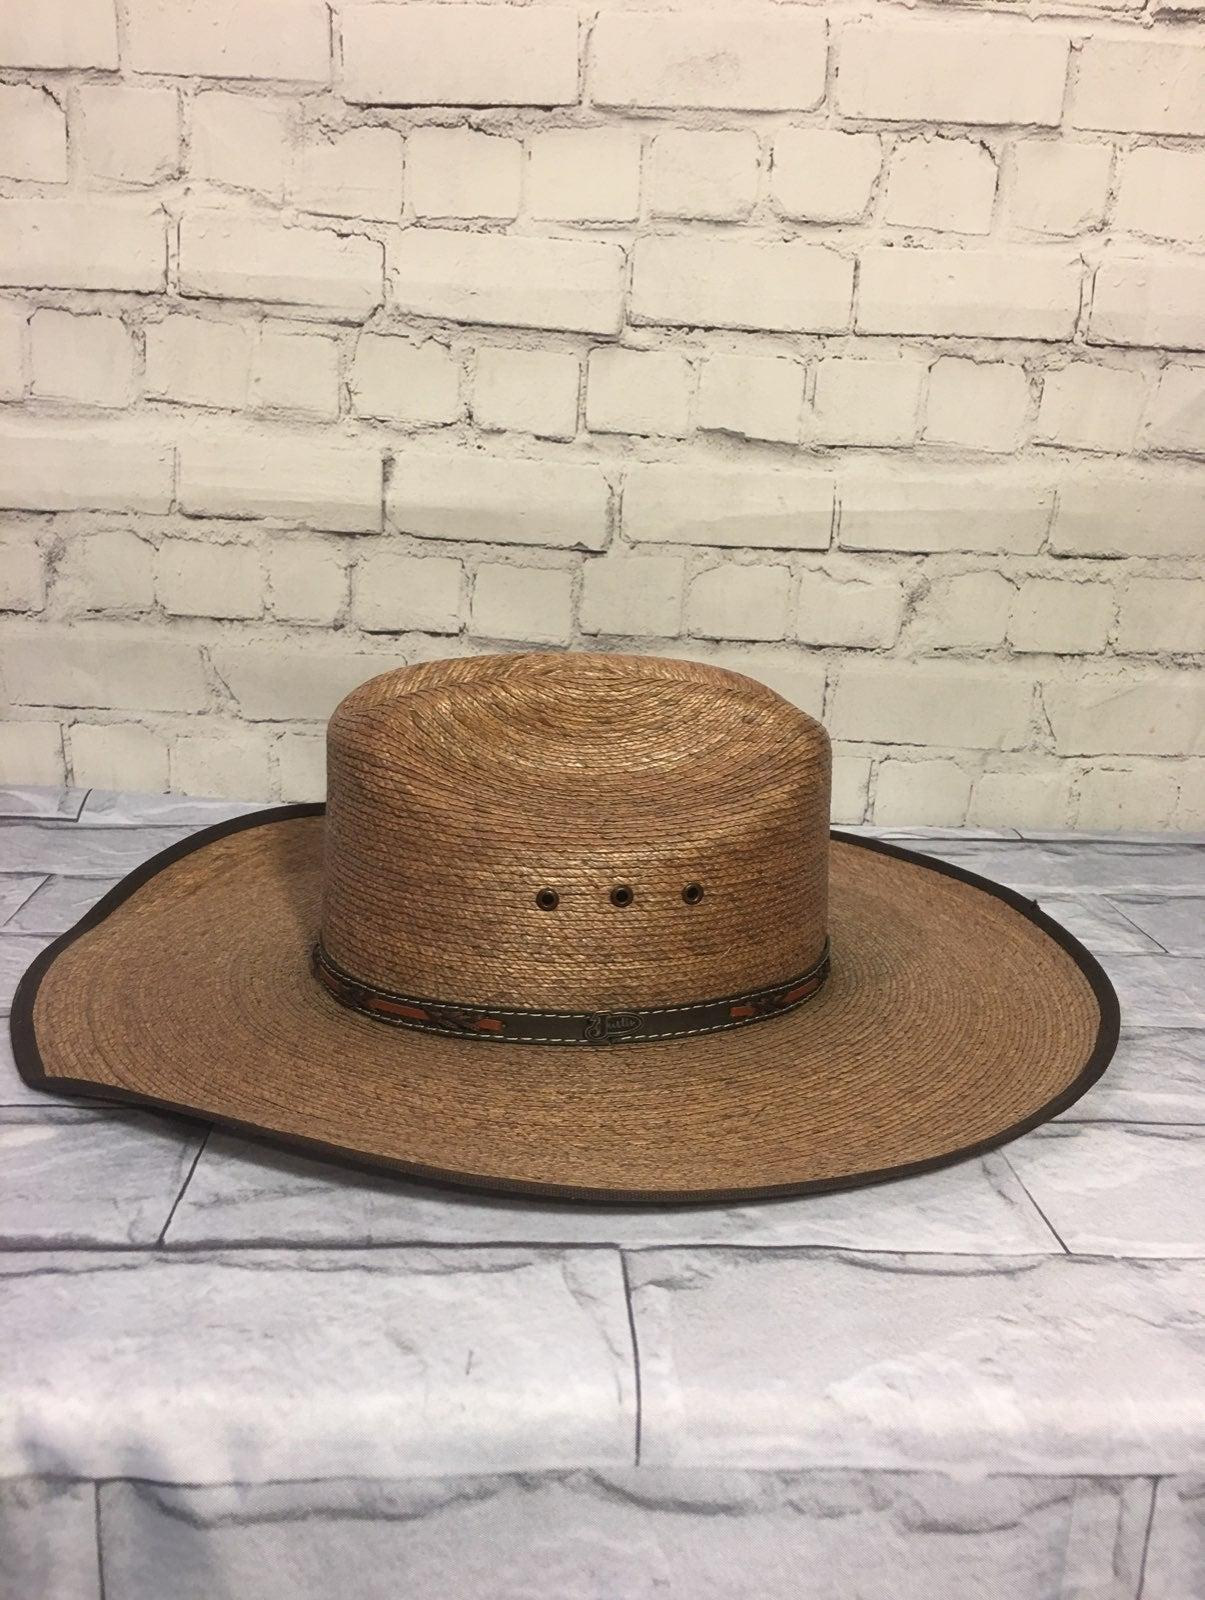 Justin Bent Rail cowboy hat